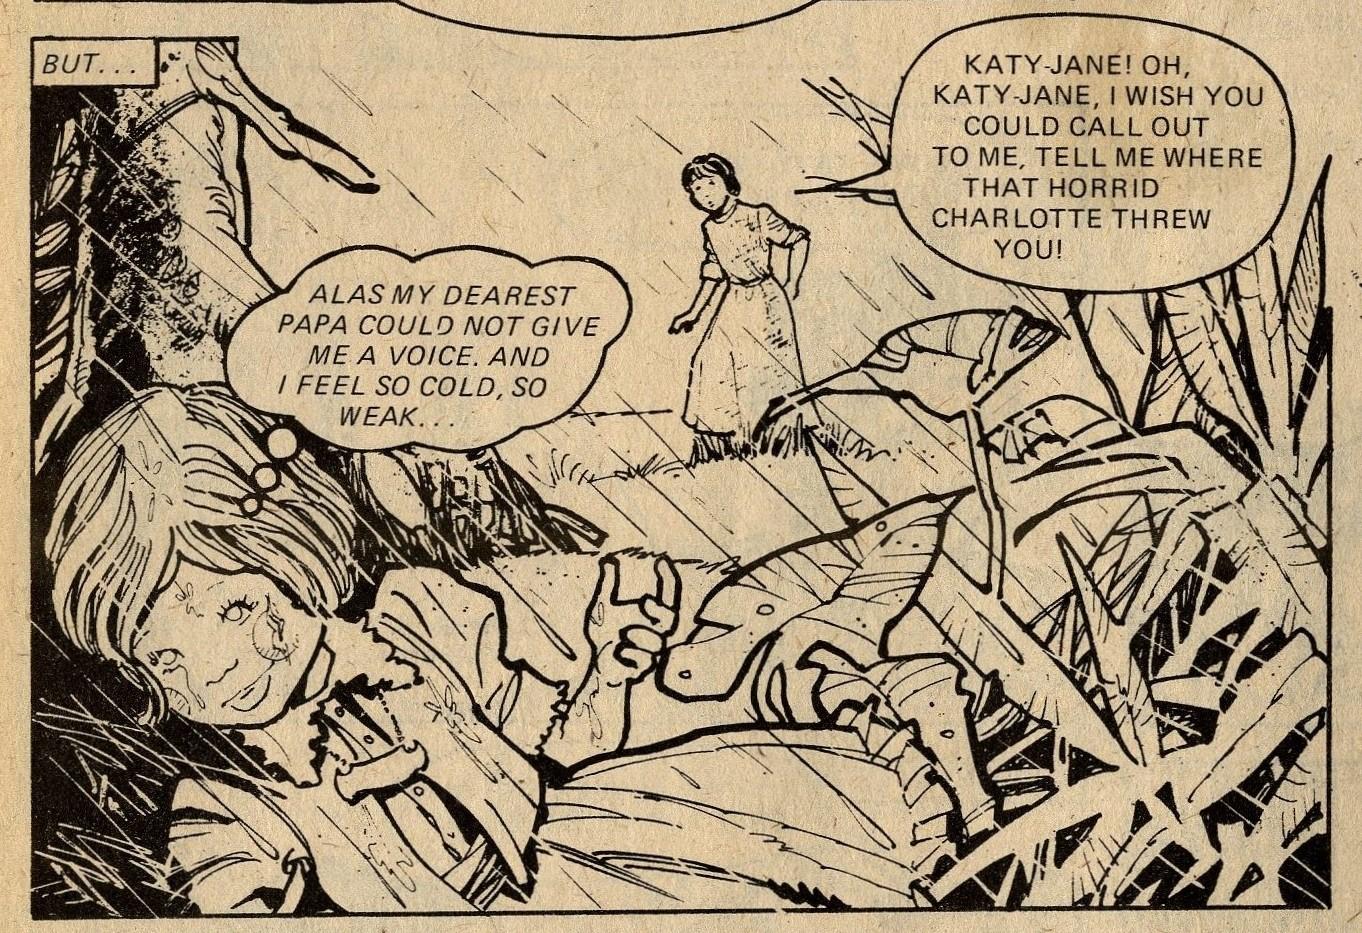 Tales of Katy Jane: creators unknown